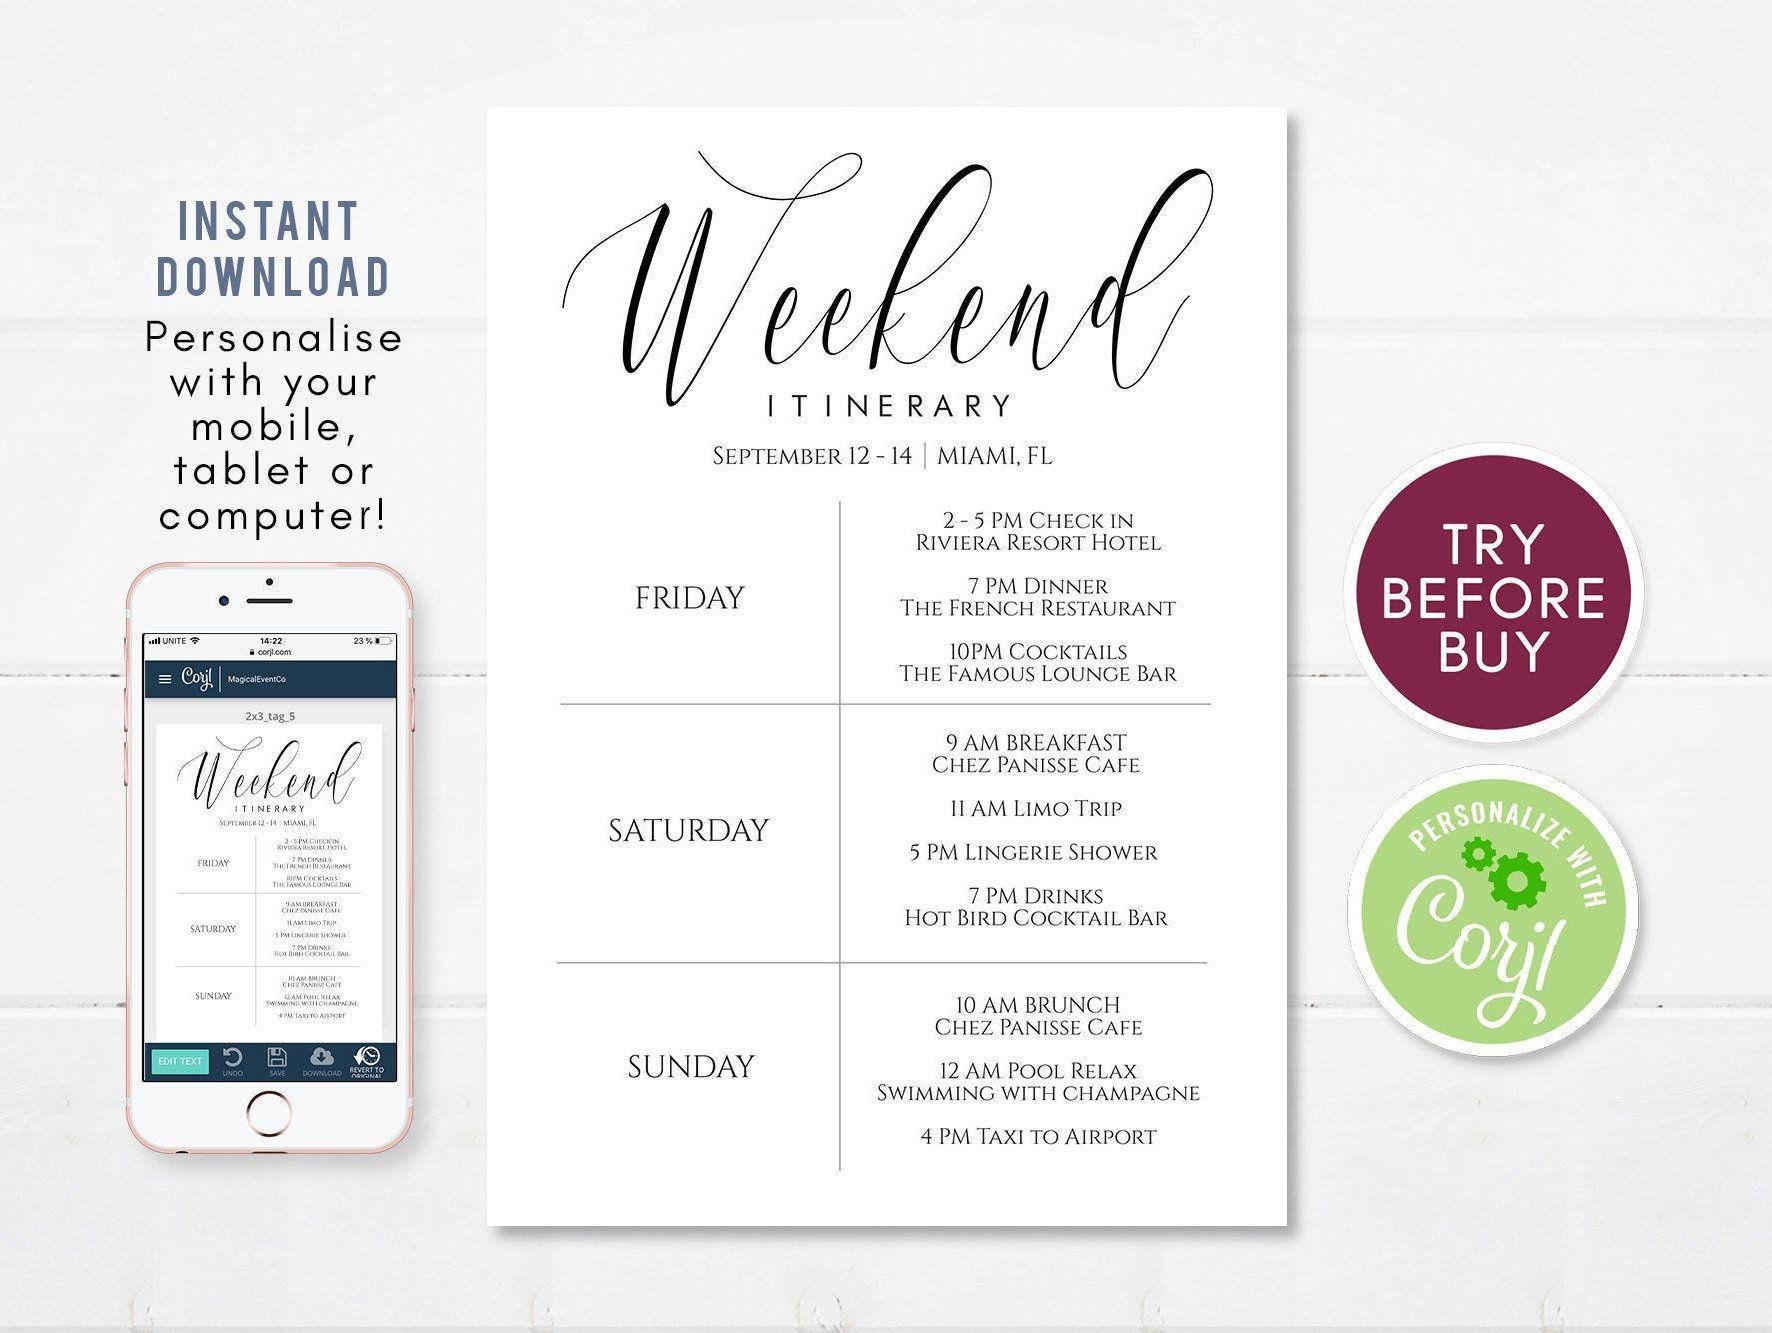 Itinerary Template Printable Bachelorette Itinerary Weekend Etsy Bachelorette Itinerary Itinerary Template Itinerary Template Free